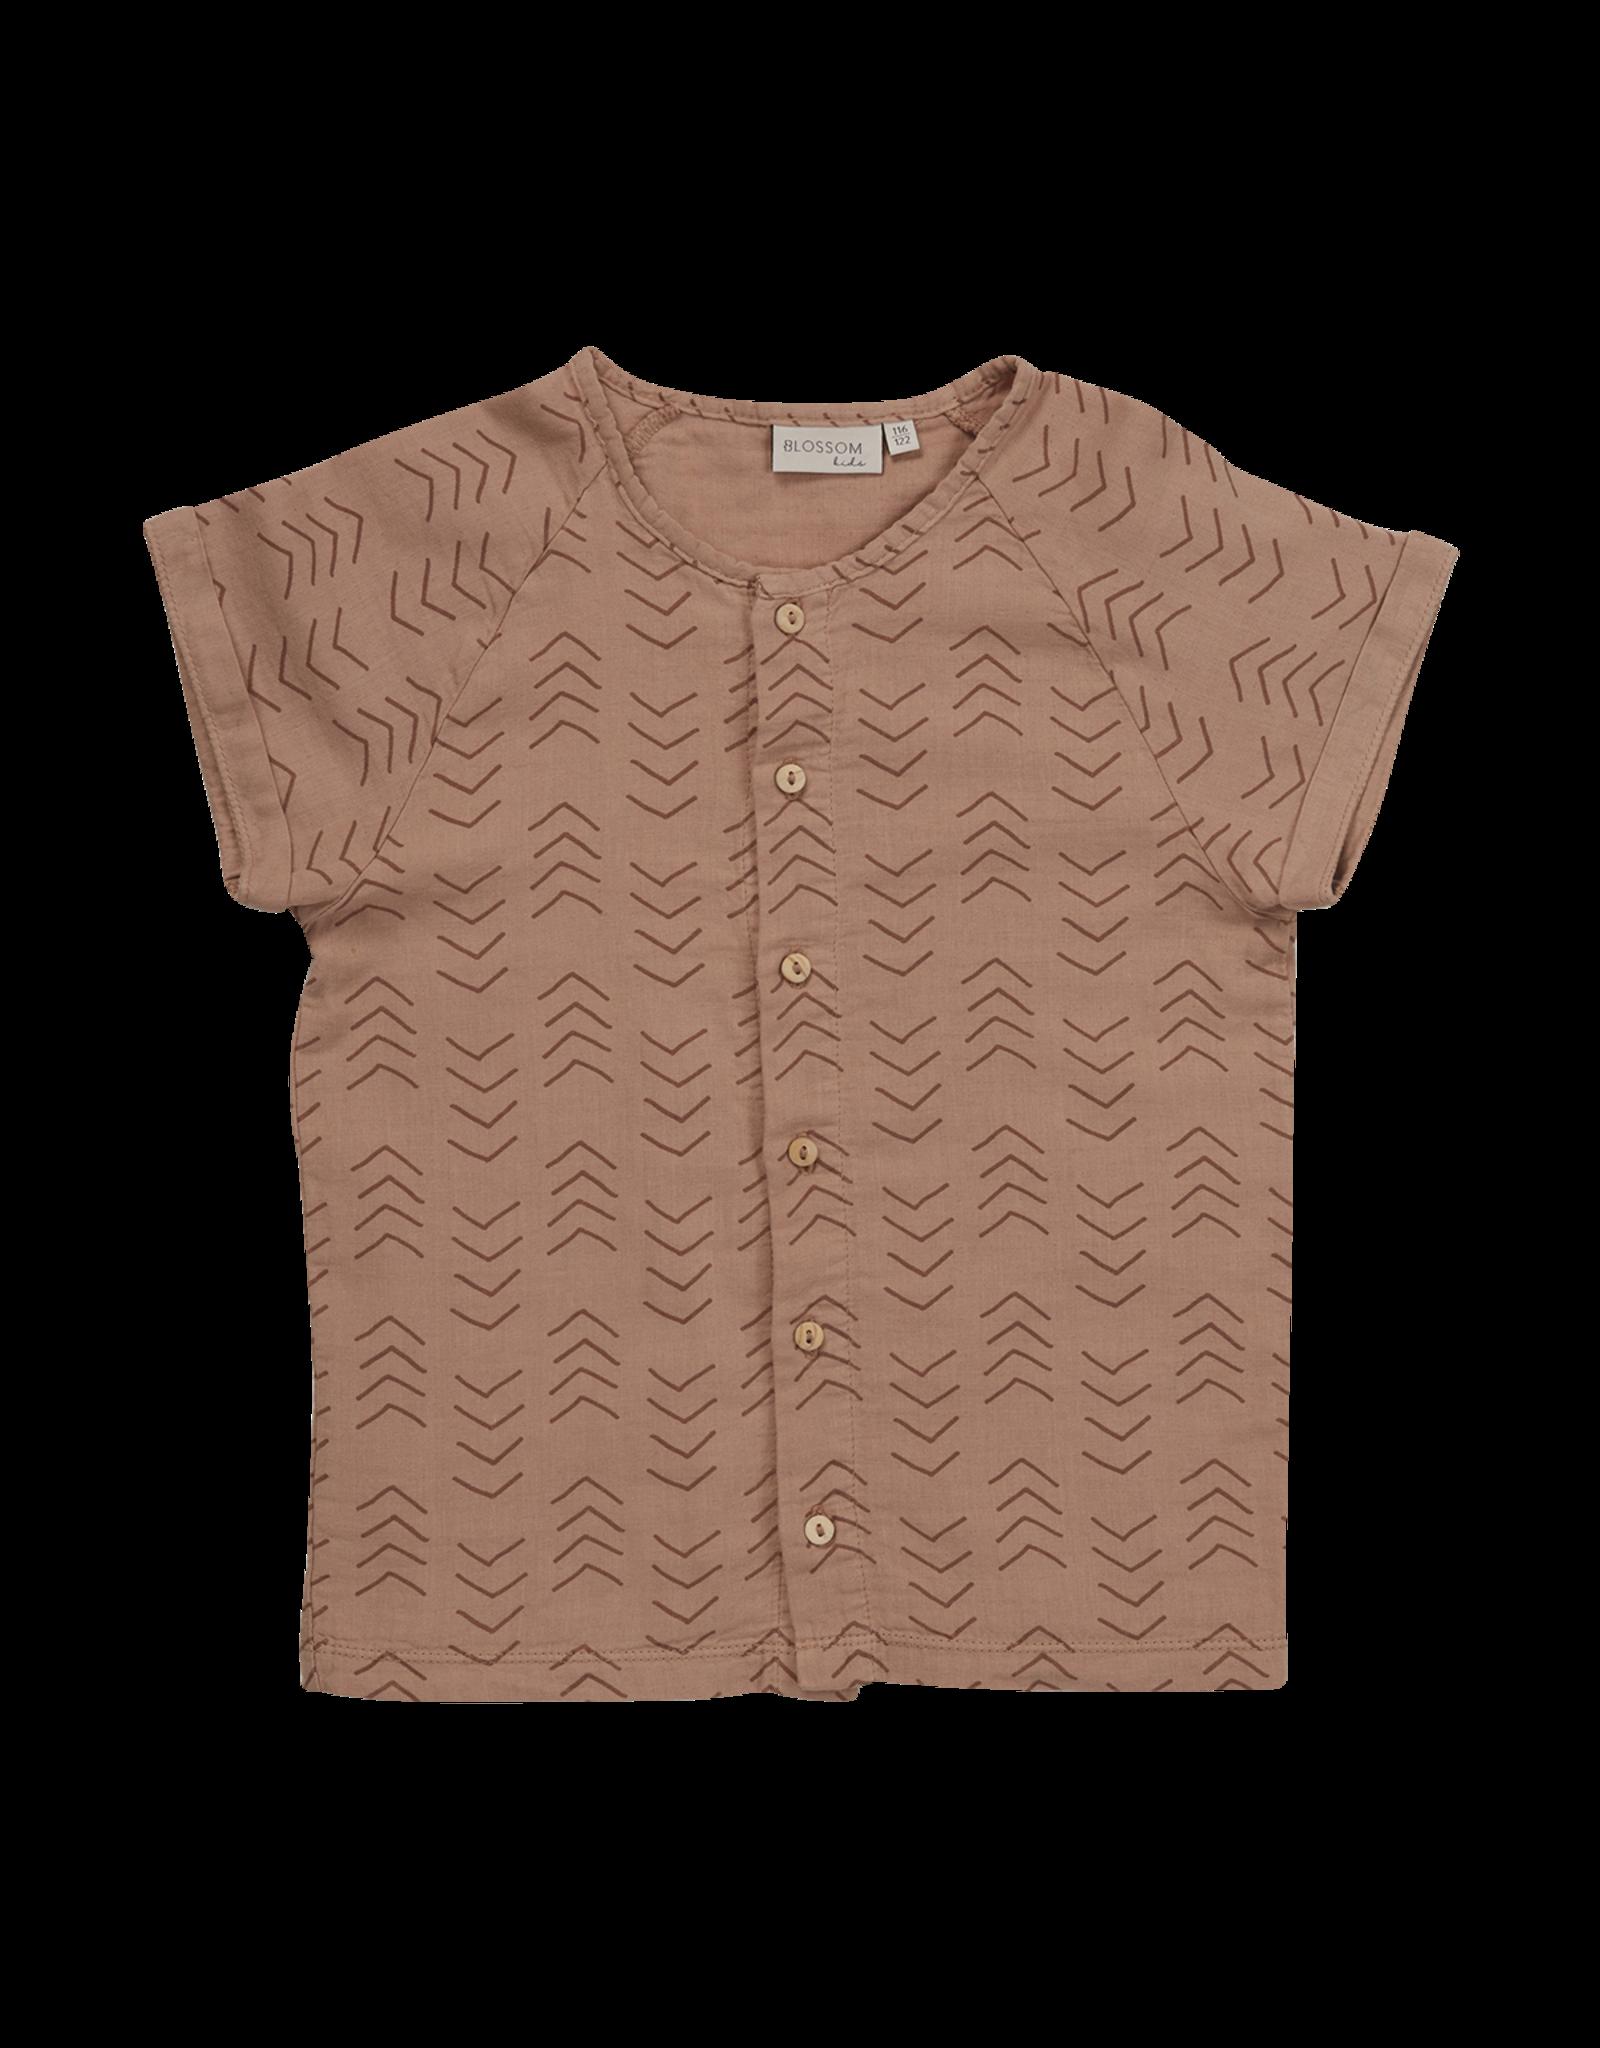 Blossom Kids BK - Shirt shortsleeve - Arrow Harmony